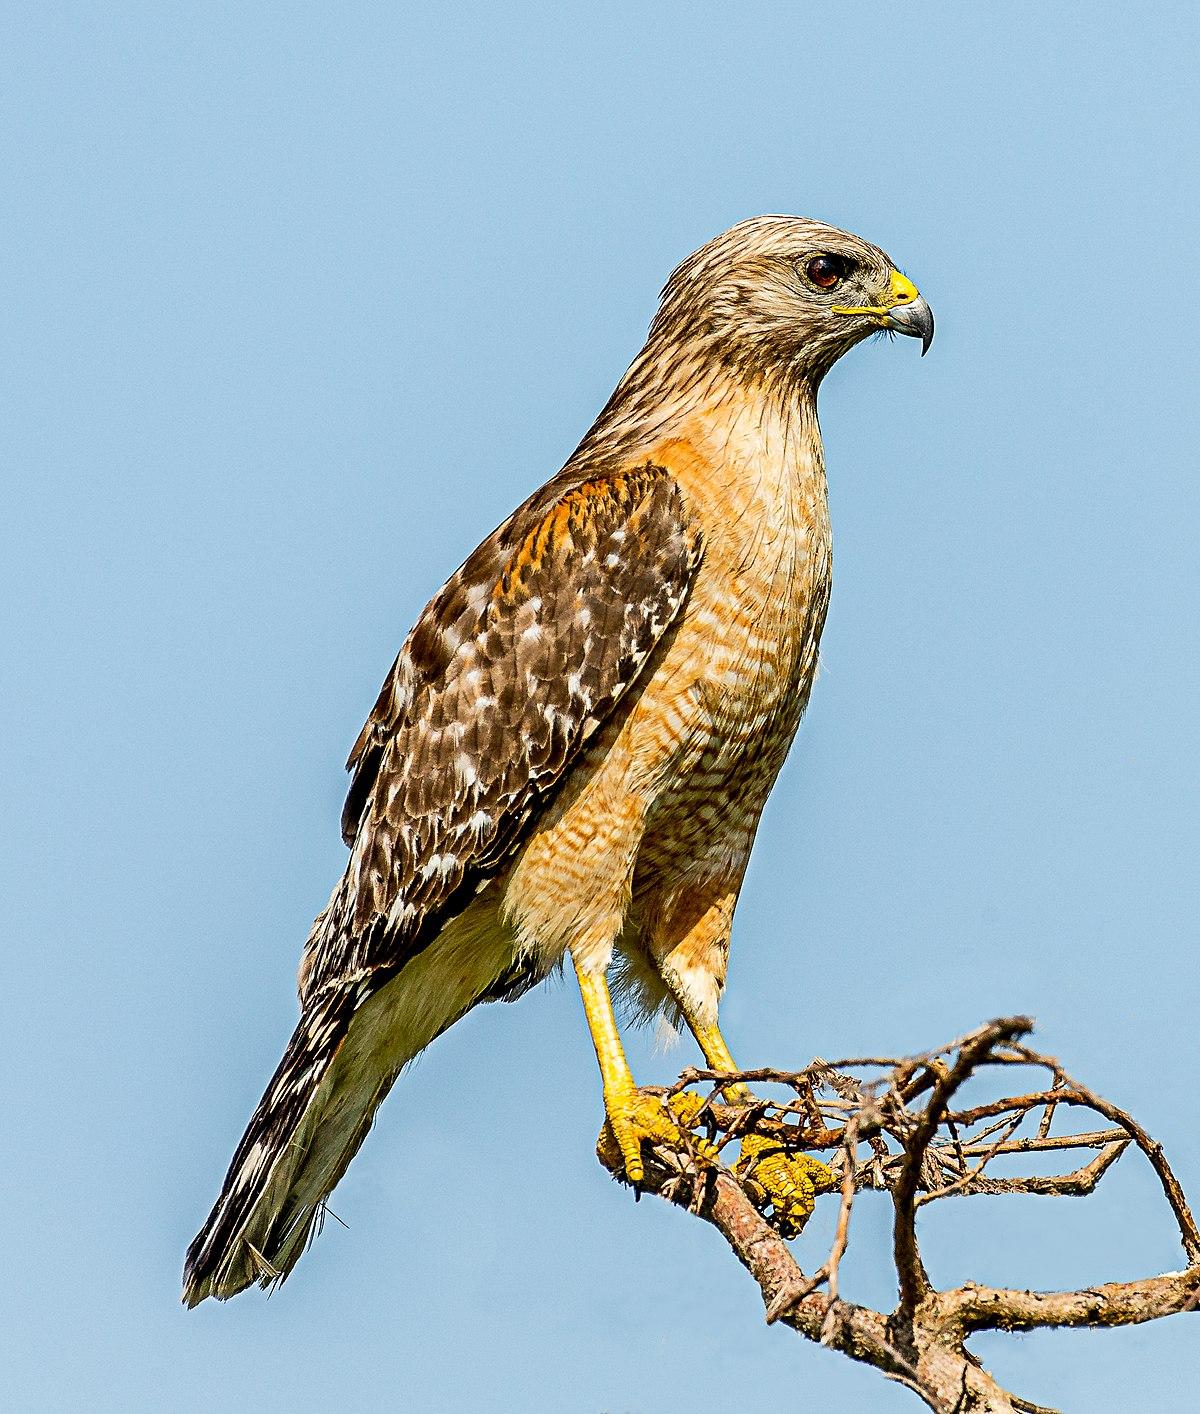 Red-shouldered hawk - Wikipedia